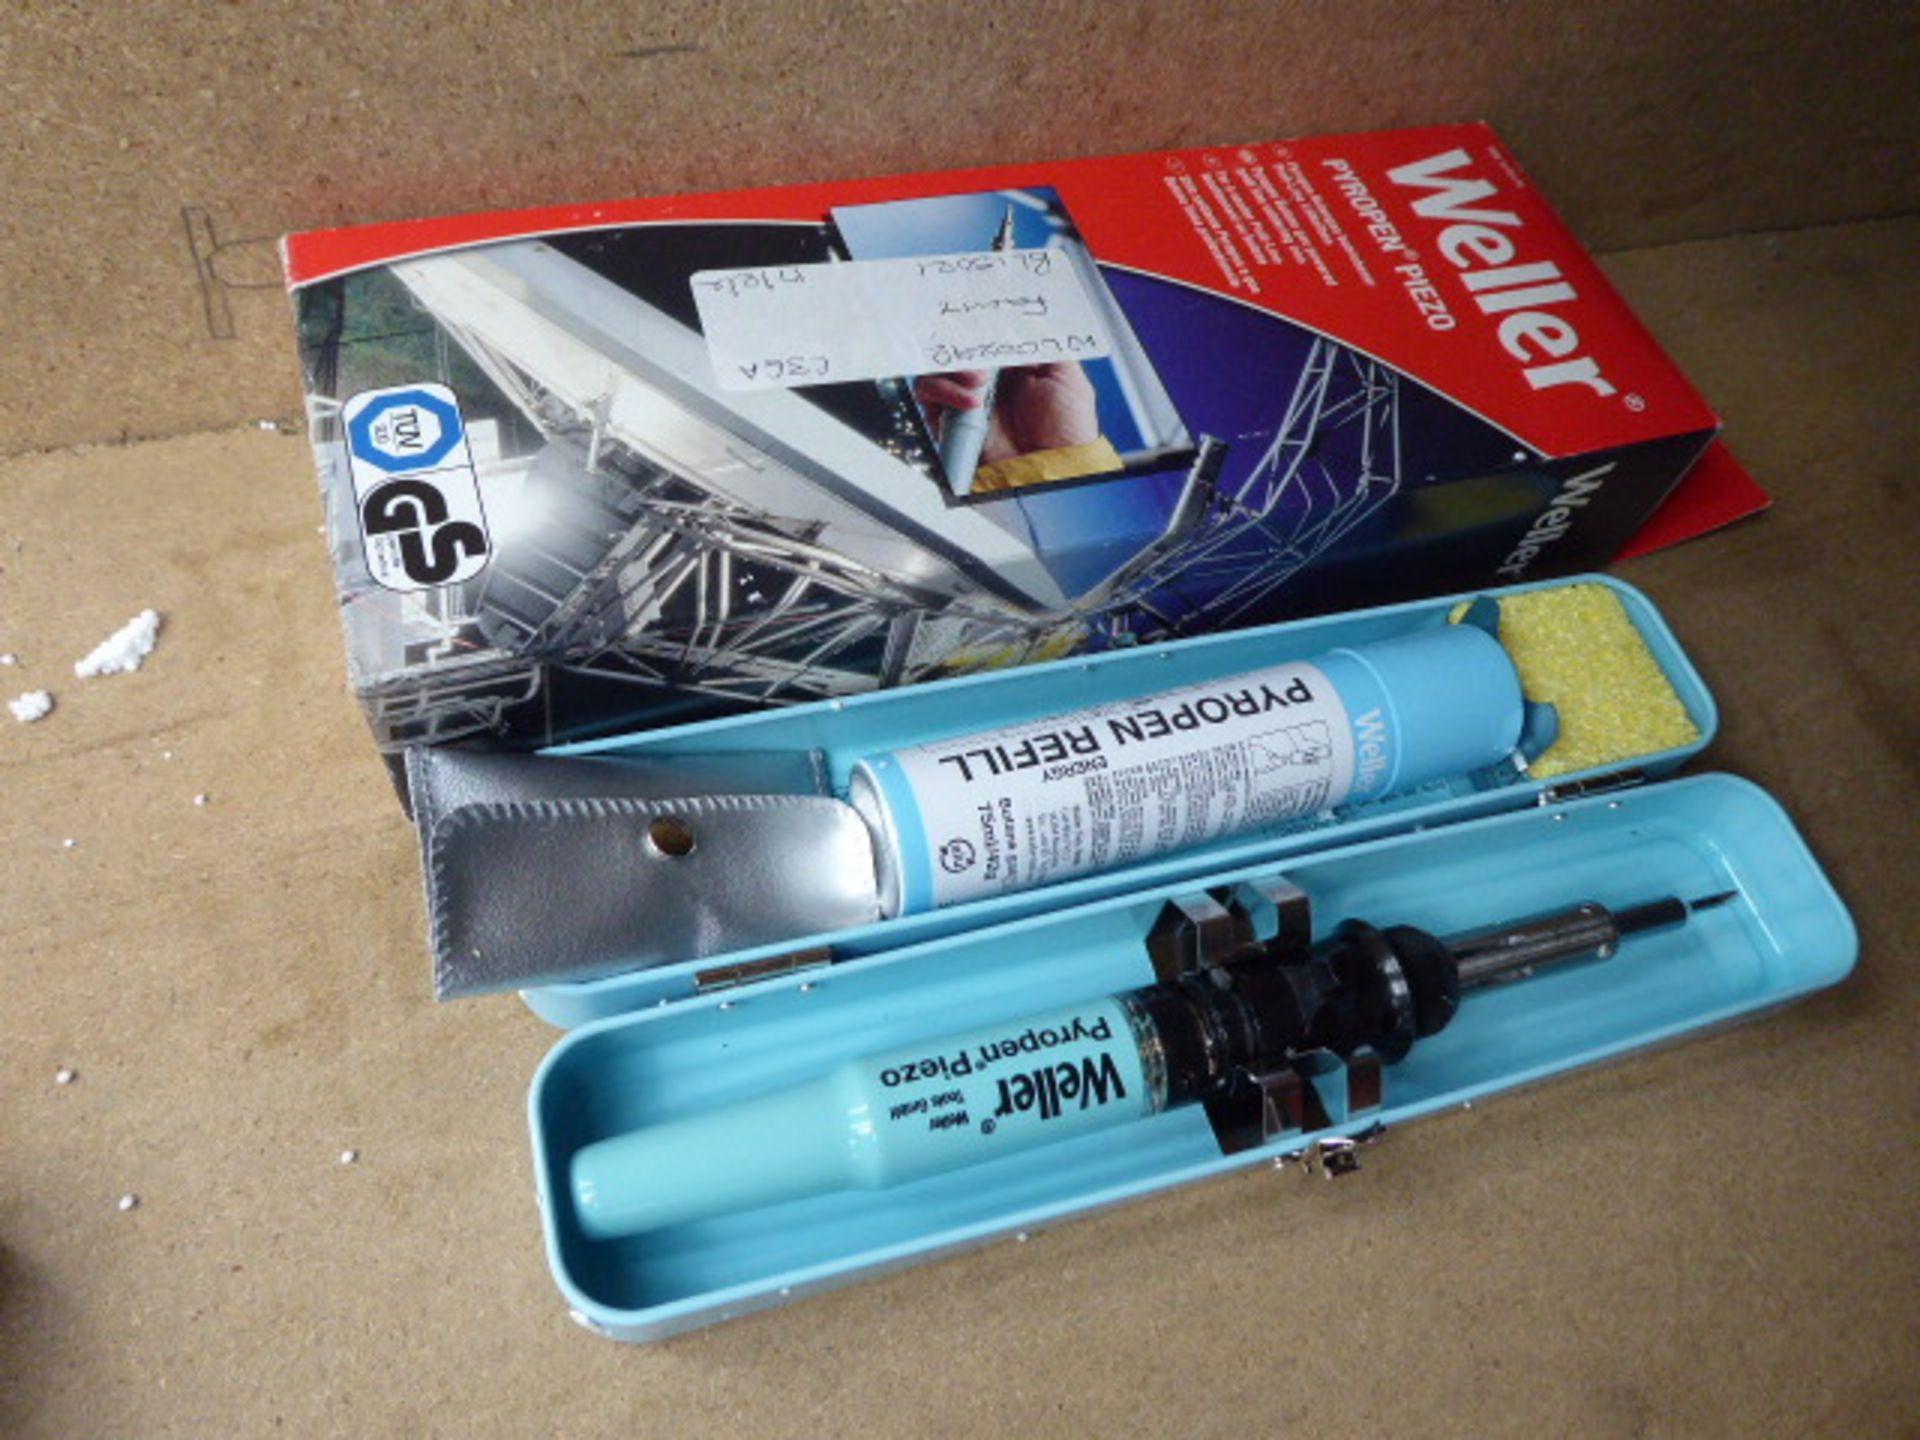 2 Weller braising tools